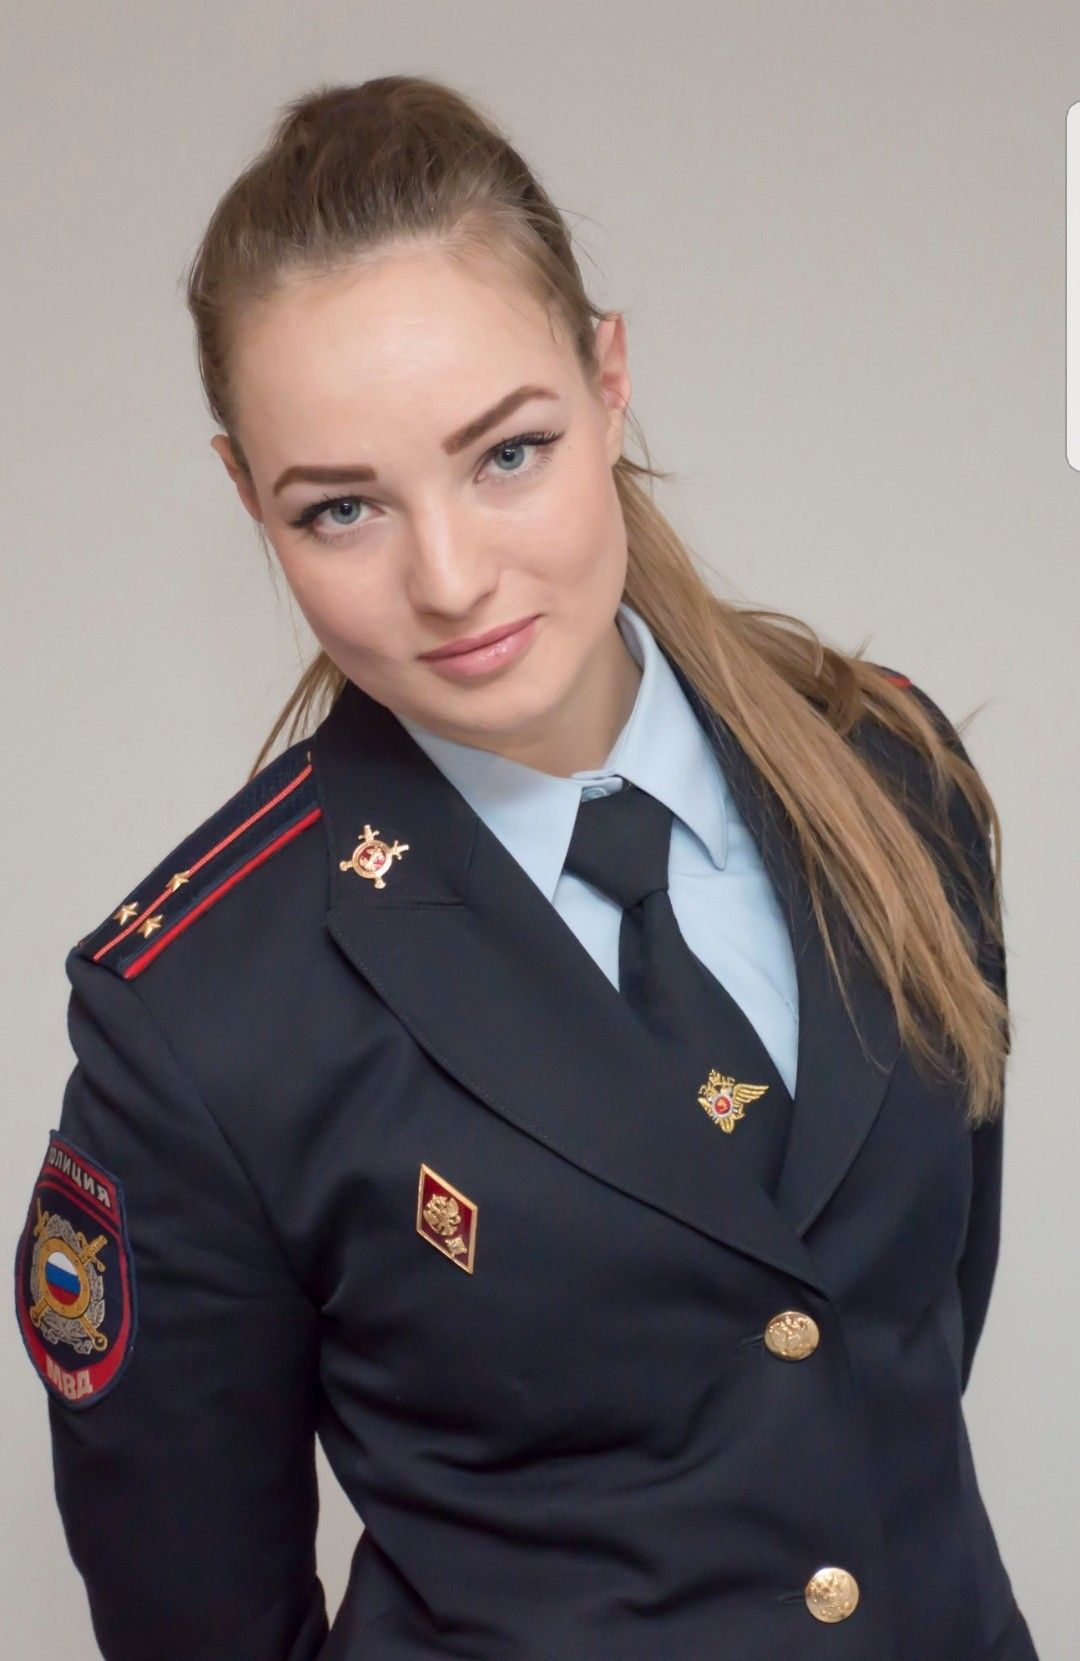 Pin By Hakan Falez On Women In Uniform Military Women Military Girl Female Soldier [ 1661 x 1080 Pixel ]